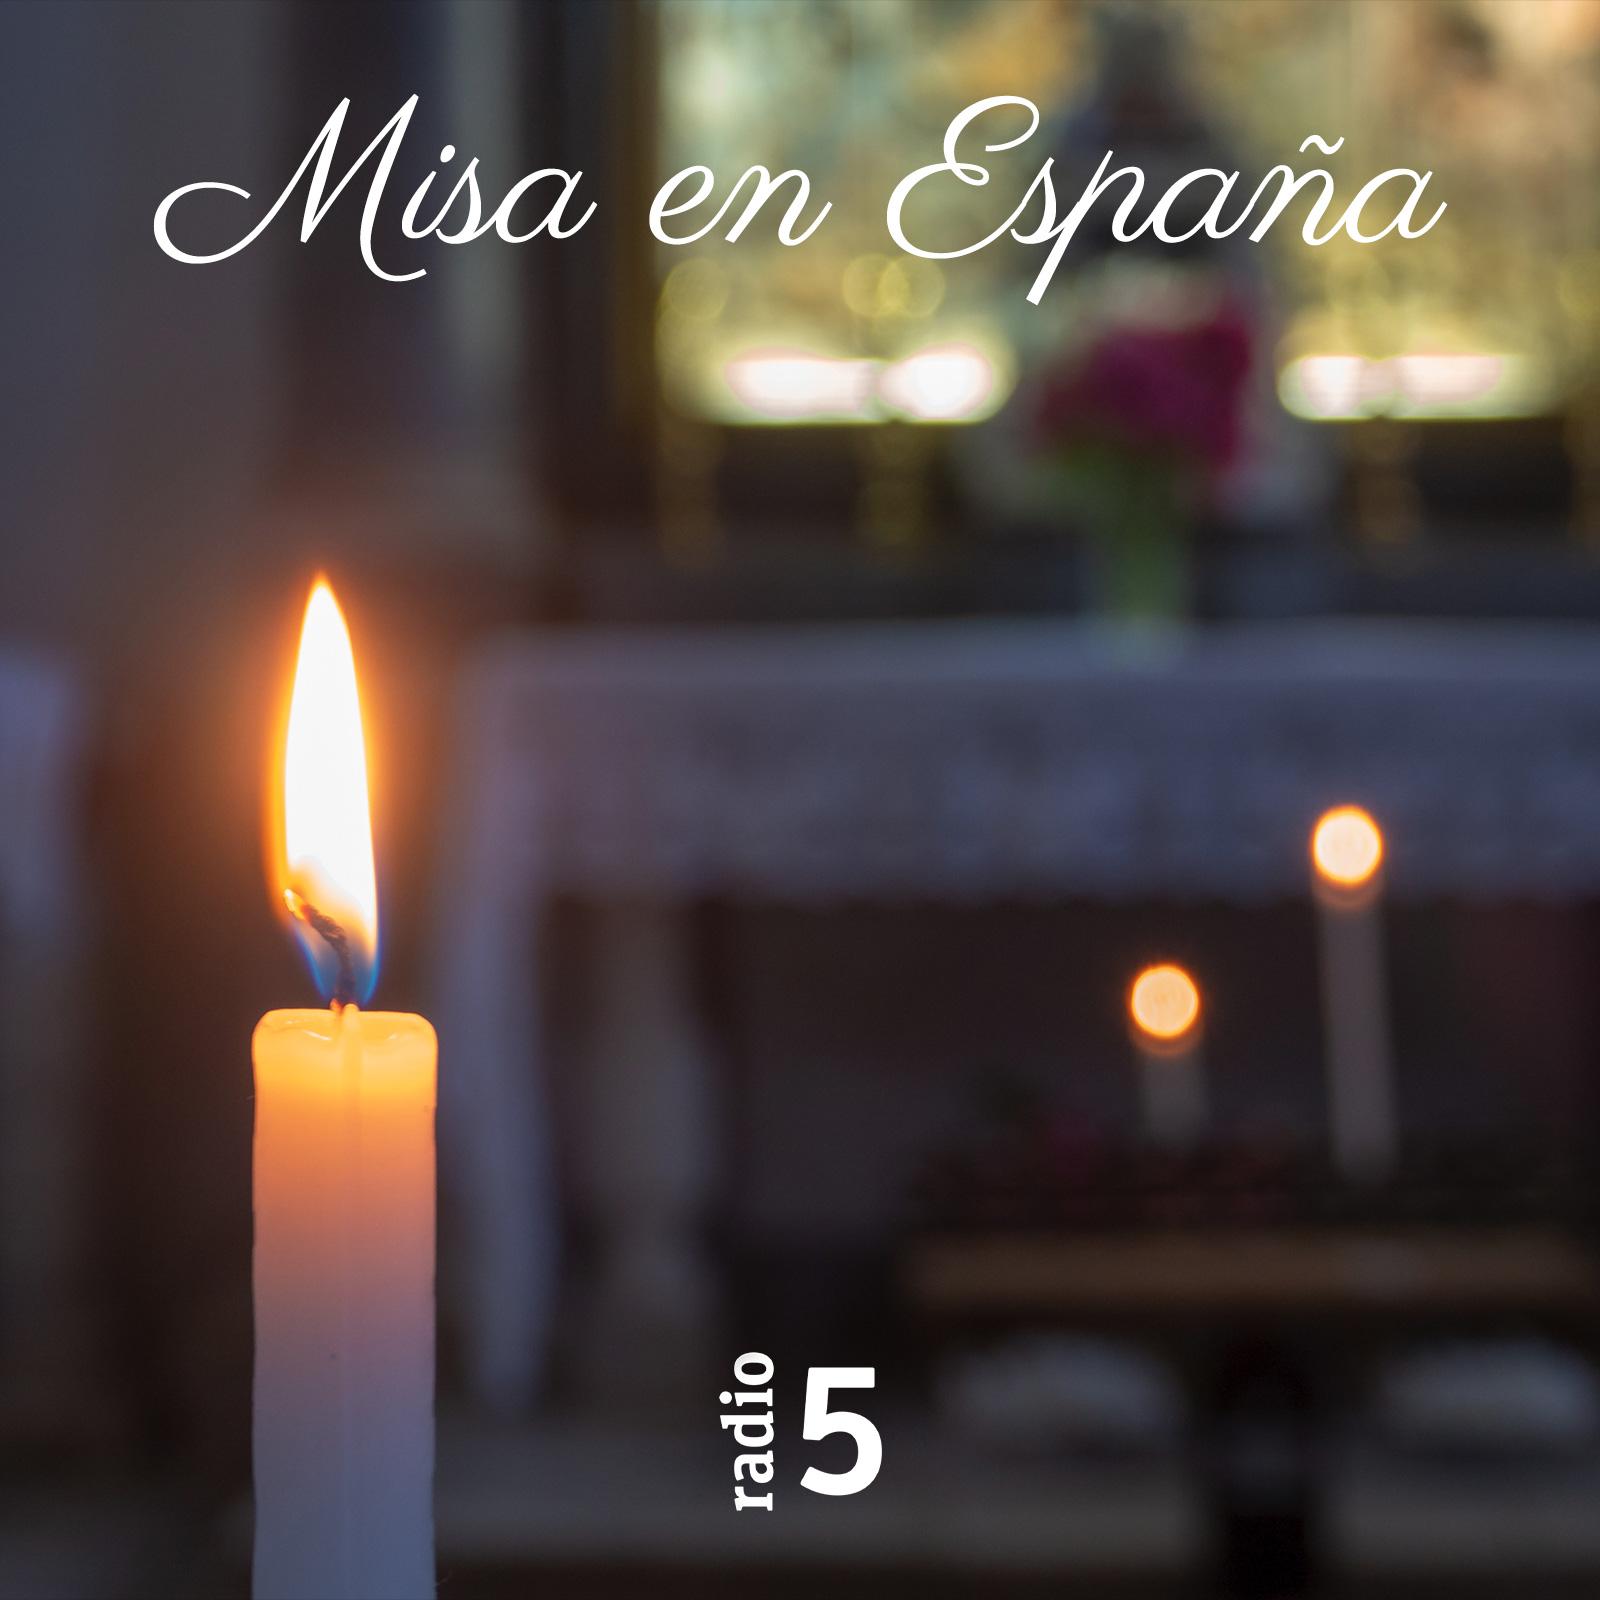 Misa en España